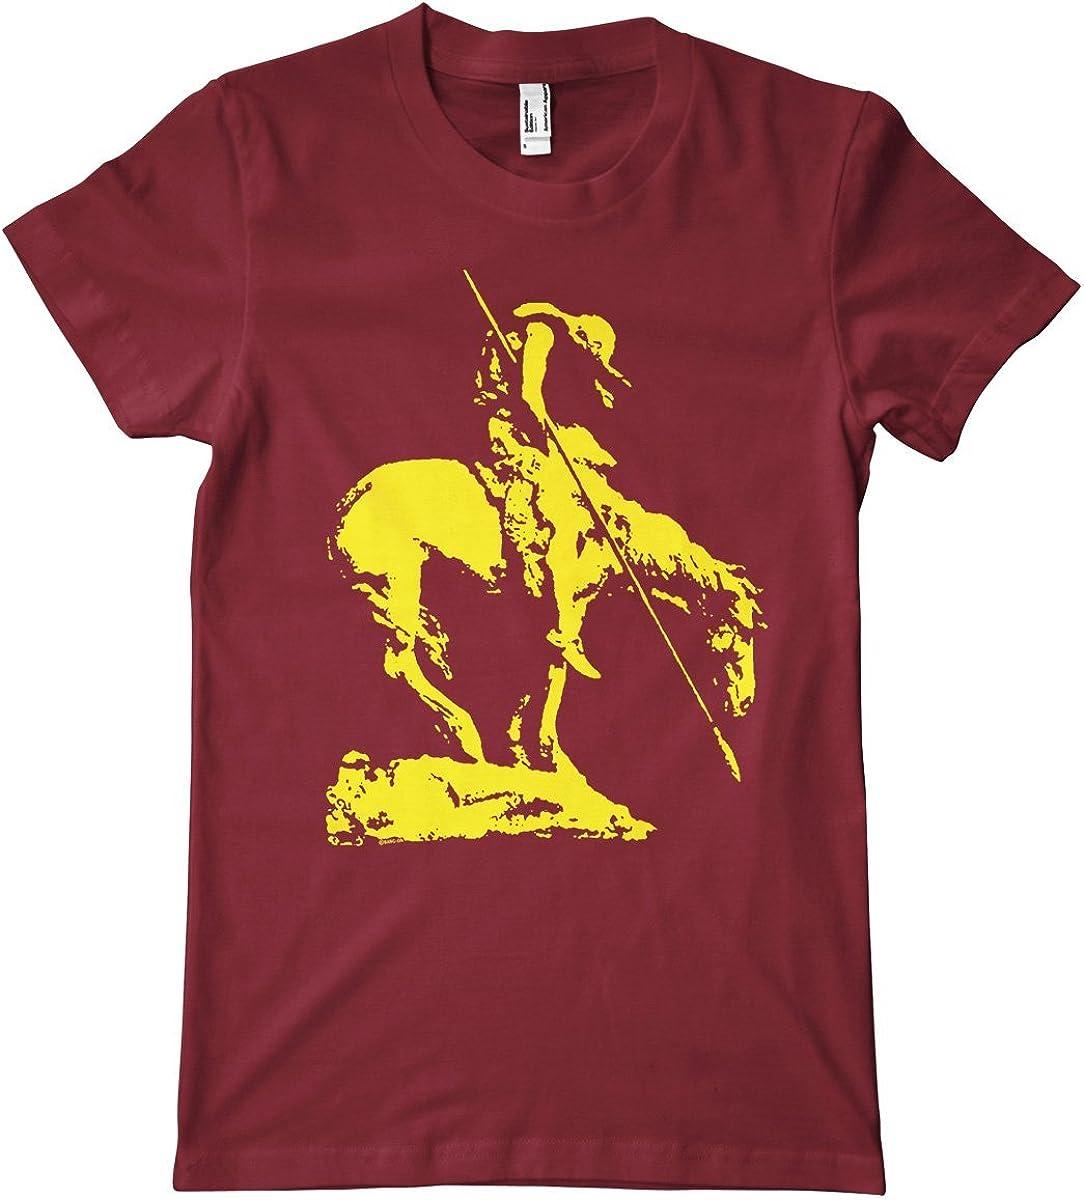 End Of Trail Native American Indian Warrior Horse David Gonzales Art DGA T Shirt